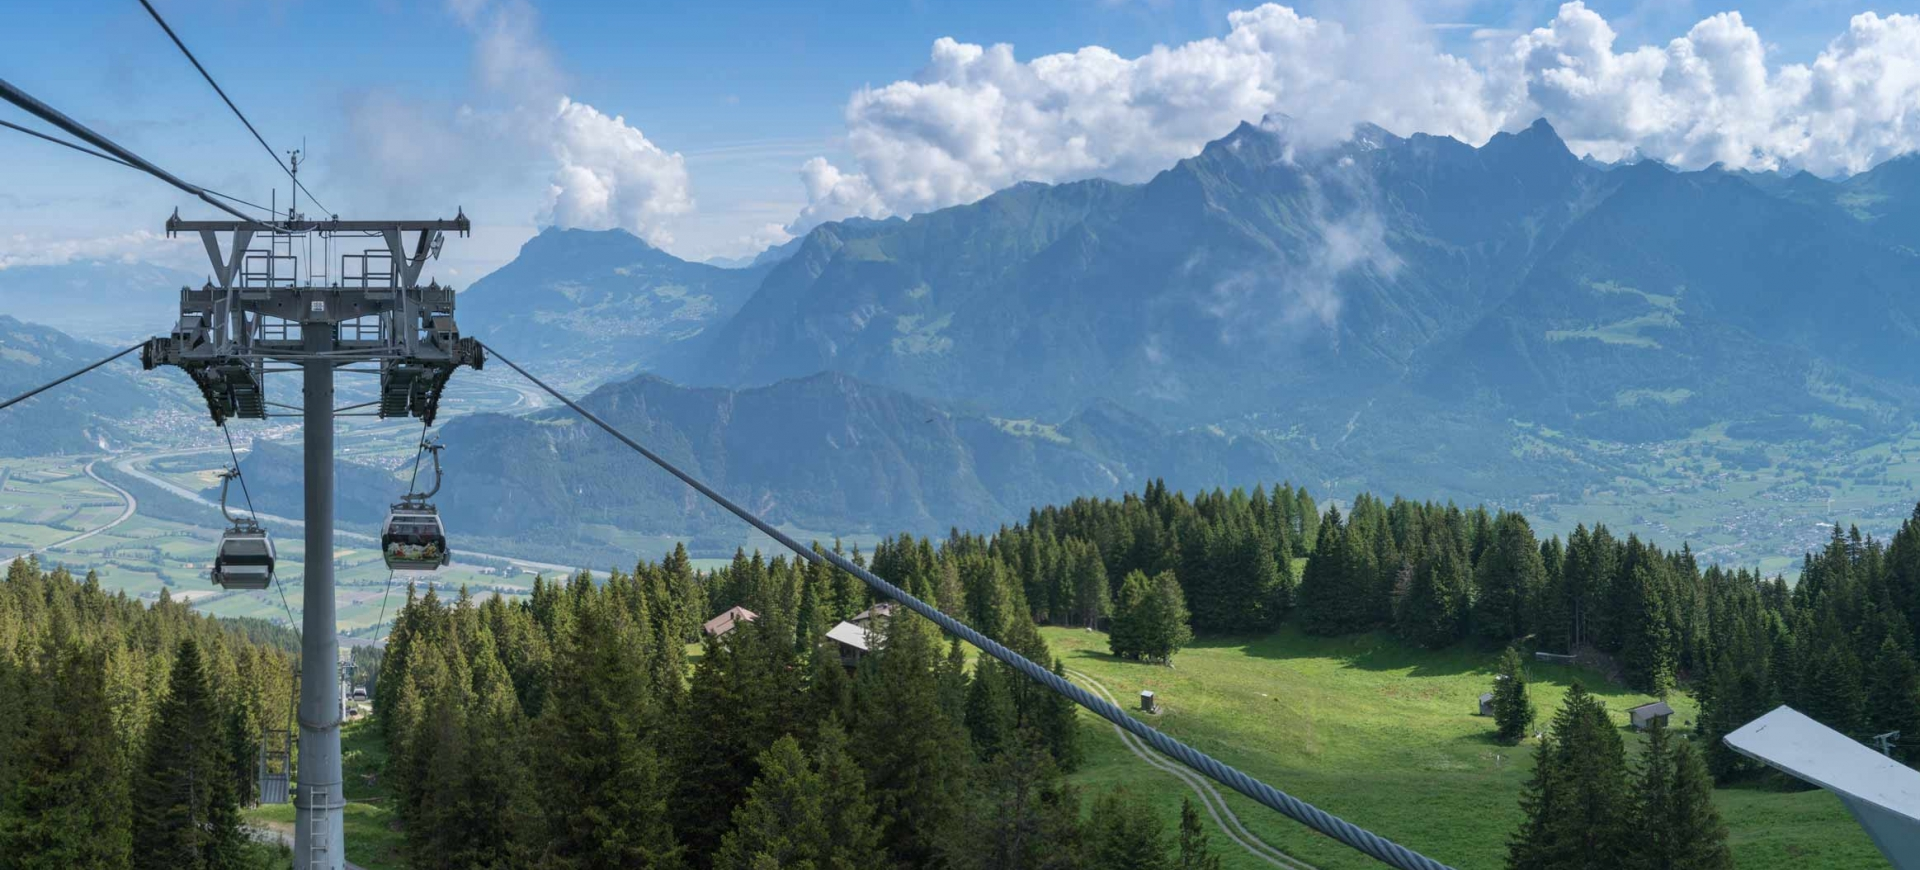 bergbahnen und skilift eingangssystem n-tree